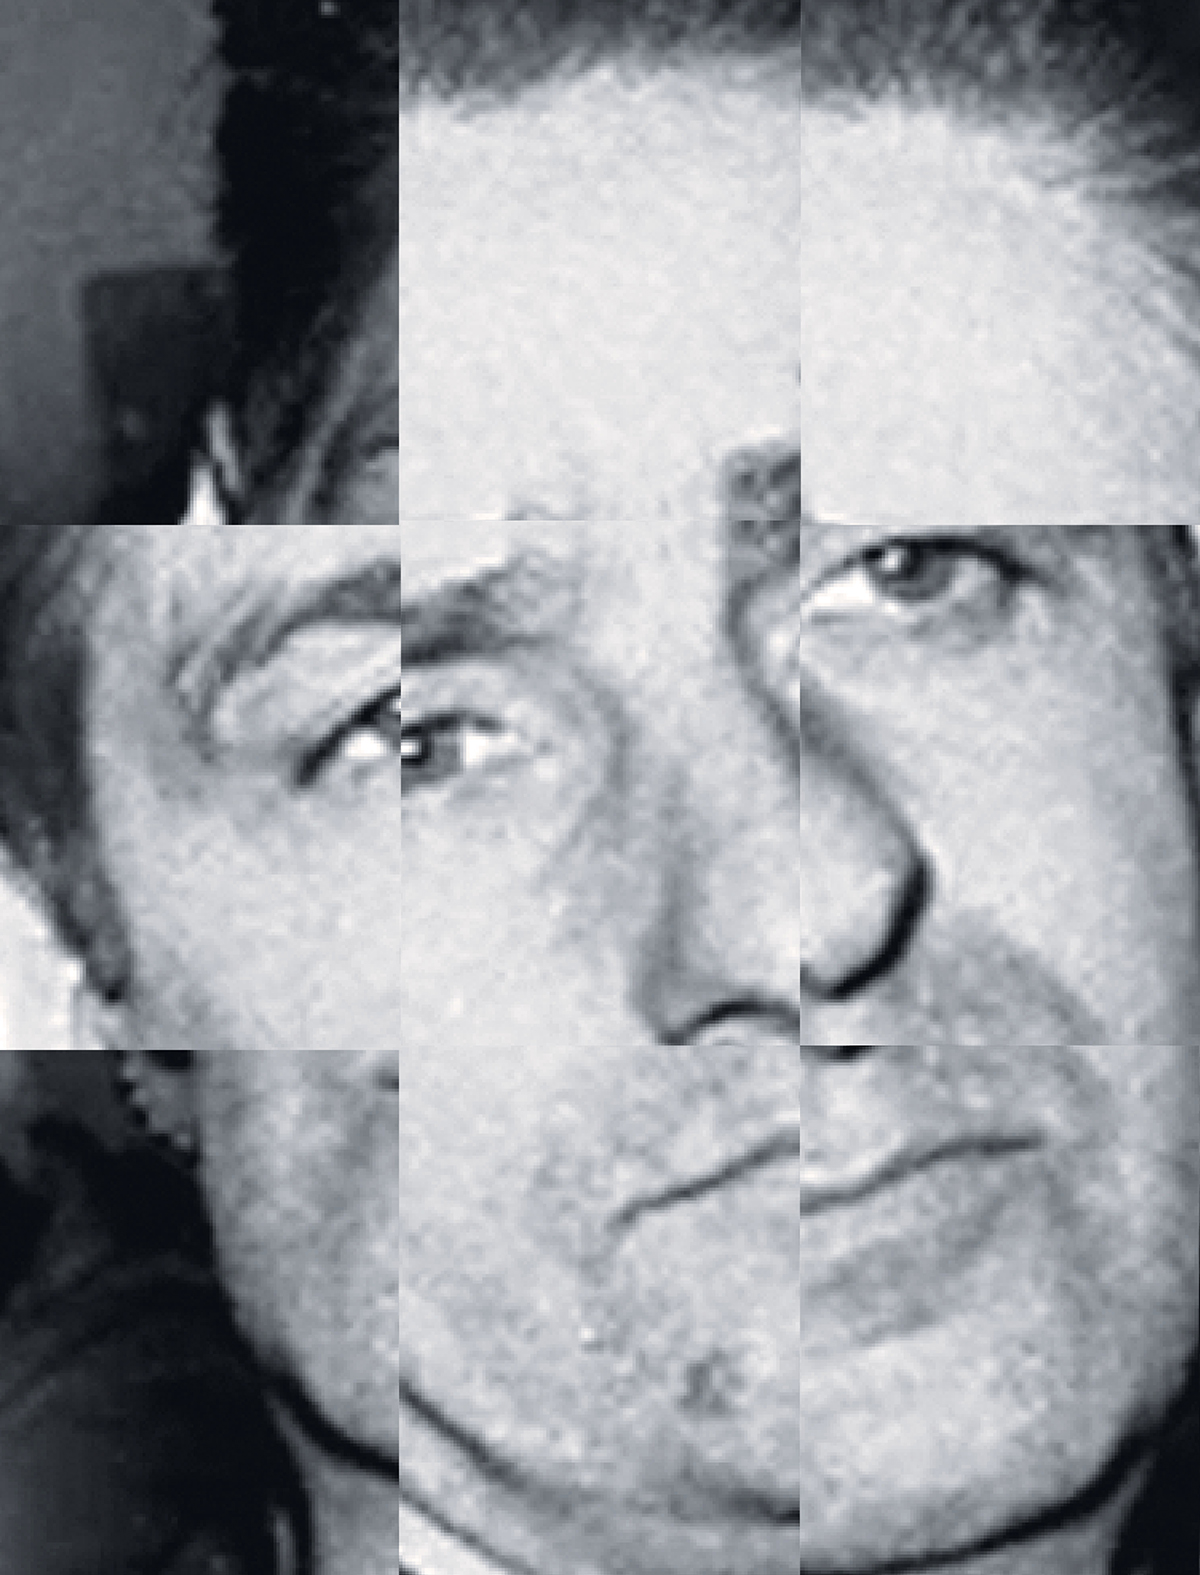 Expert Advice: Twenty-One Tales of Murder and Mayhem